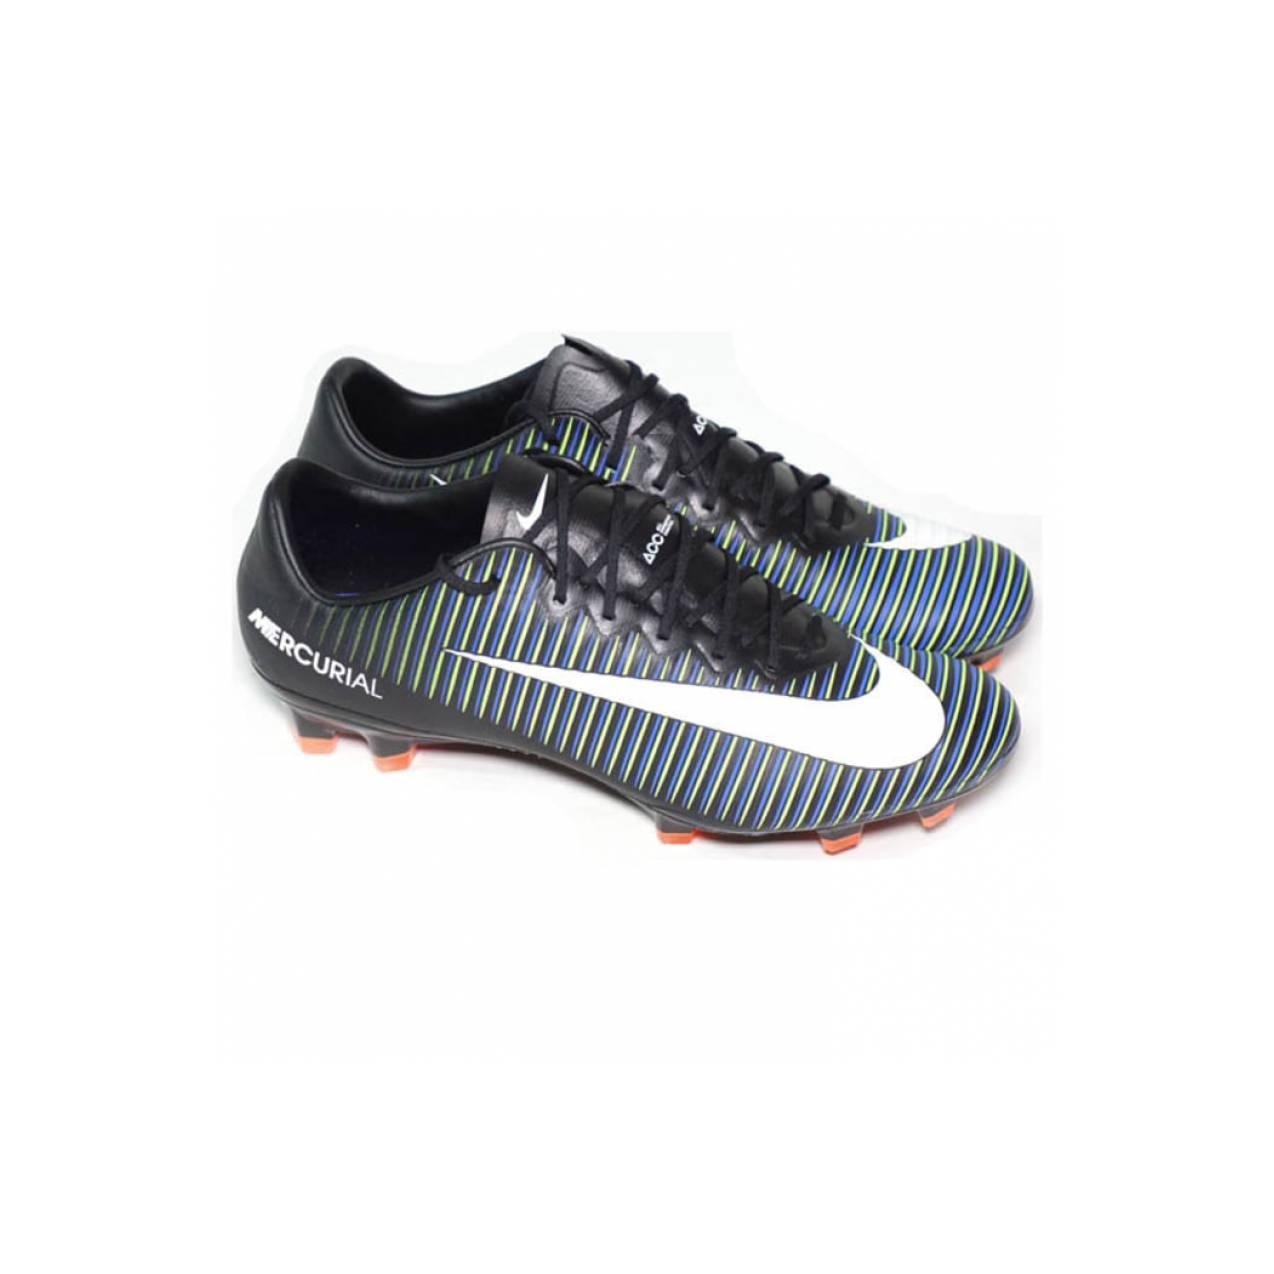 Sepatu Bola Nike Mercurial Vapor Xi Fg - Black White Electric Green